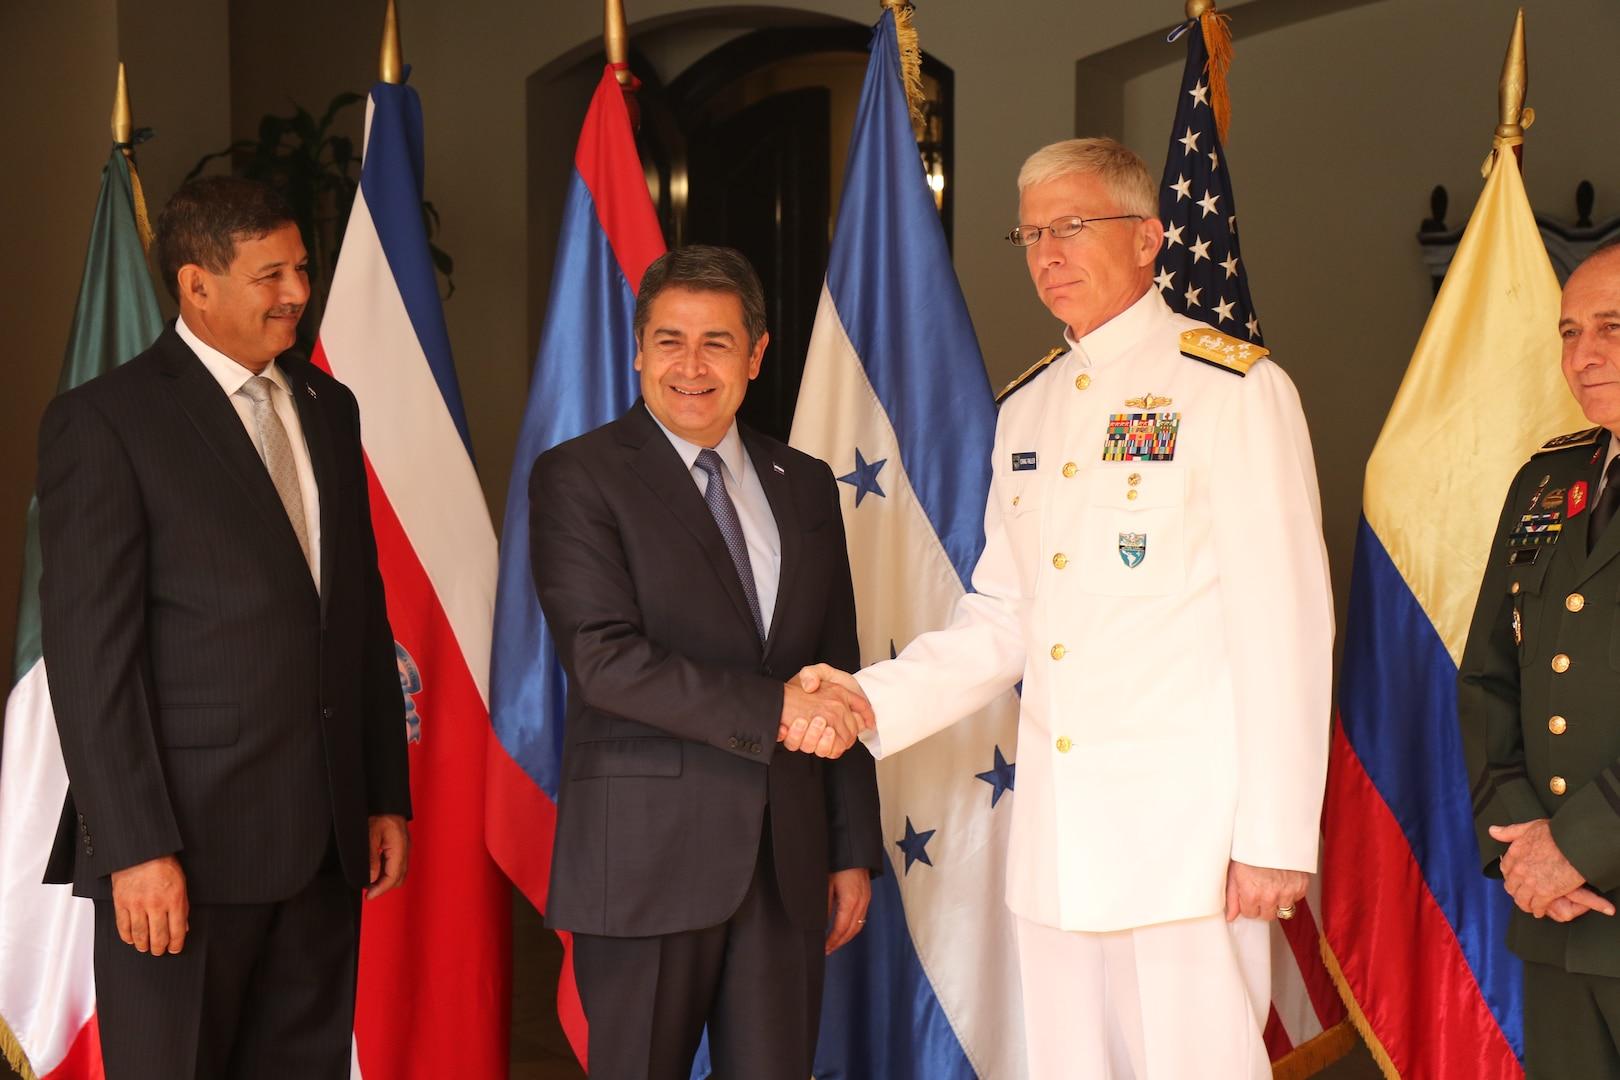 The commander of U.S. Southern Command, Navy Adm. Craig Faller, meets with Honduran President Juan Orlando Hernández.